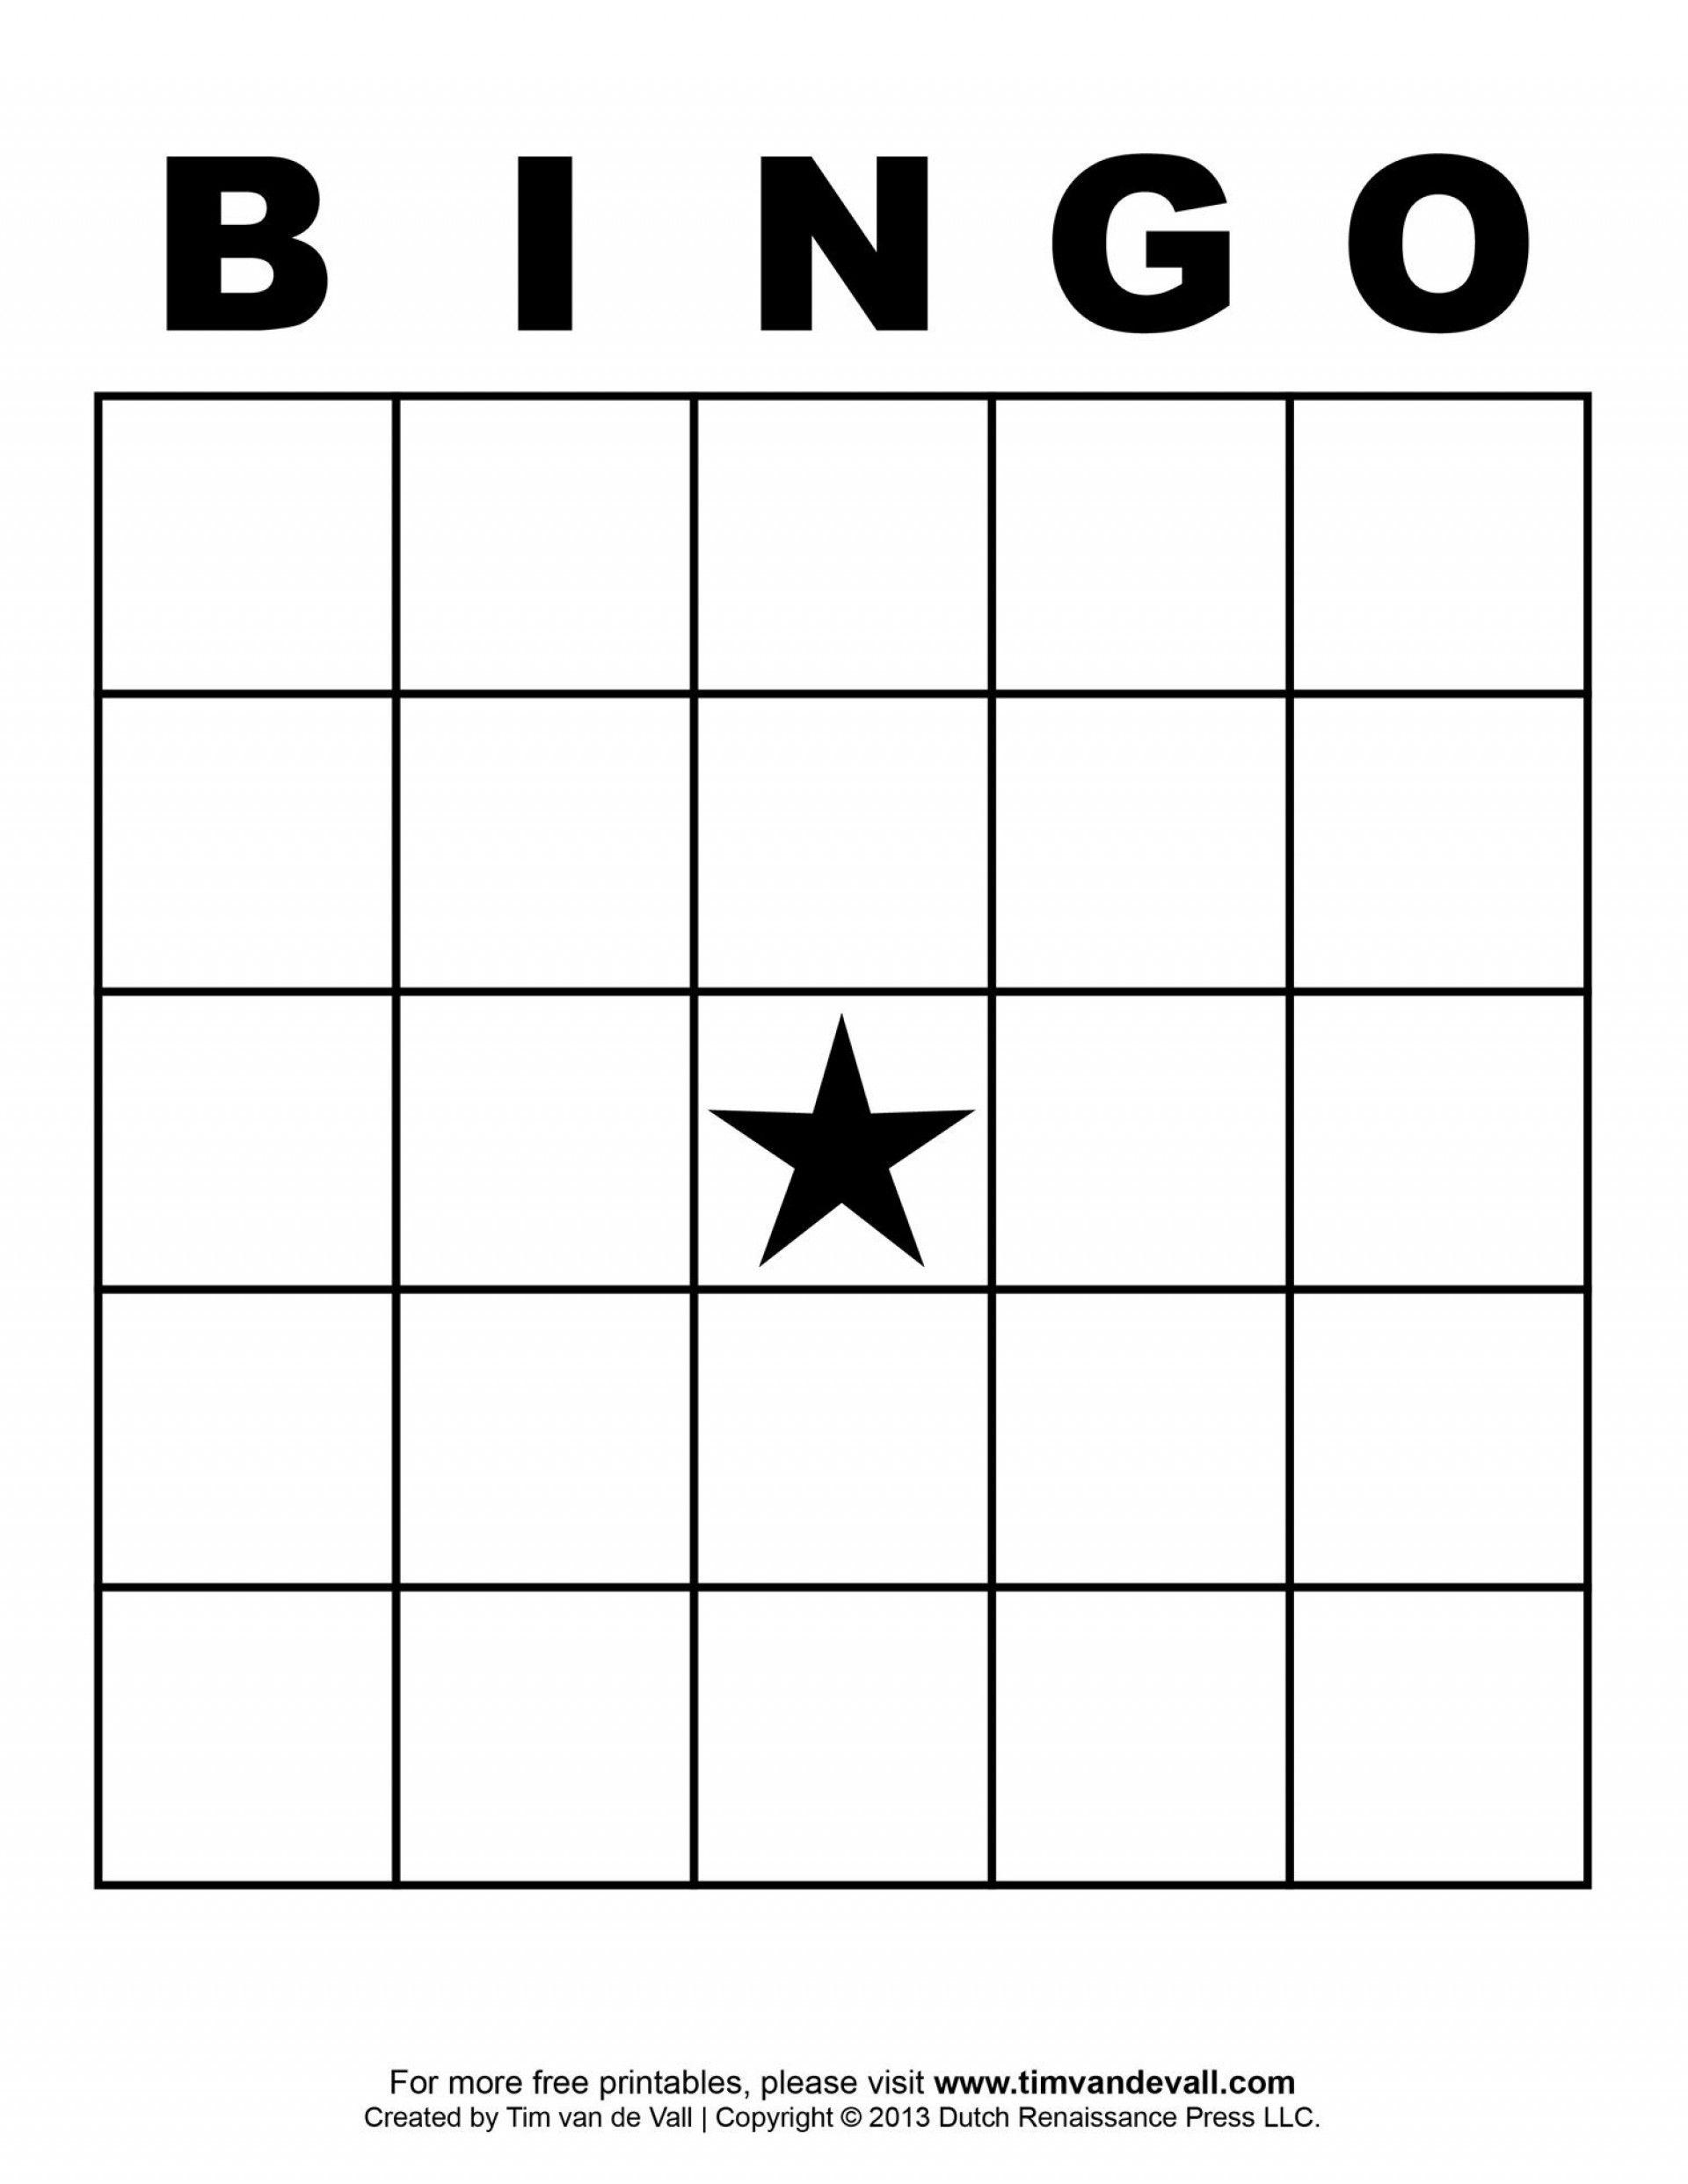 034 Template Ideas Blank Bingo Card Stirring 4x4 Excel Regarding Blank Bingo Card Template M In 2020 Free Printable Bingo Cards Bingo Cards Printable Blank Bingo Cards